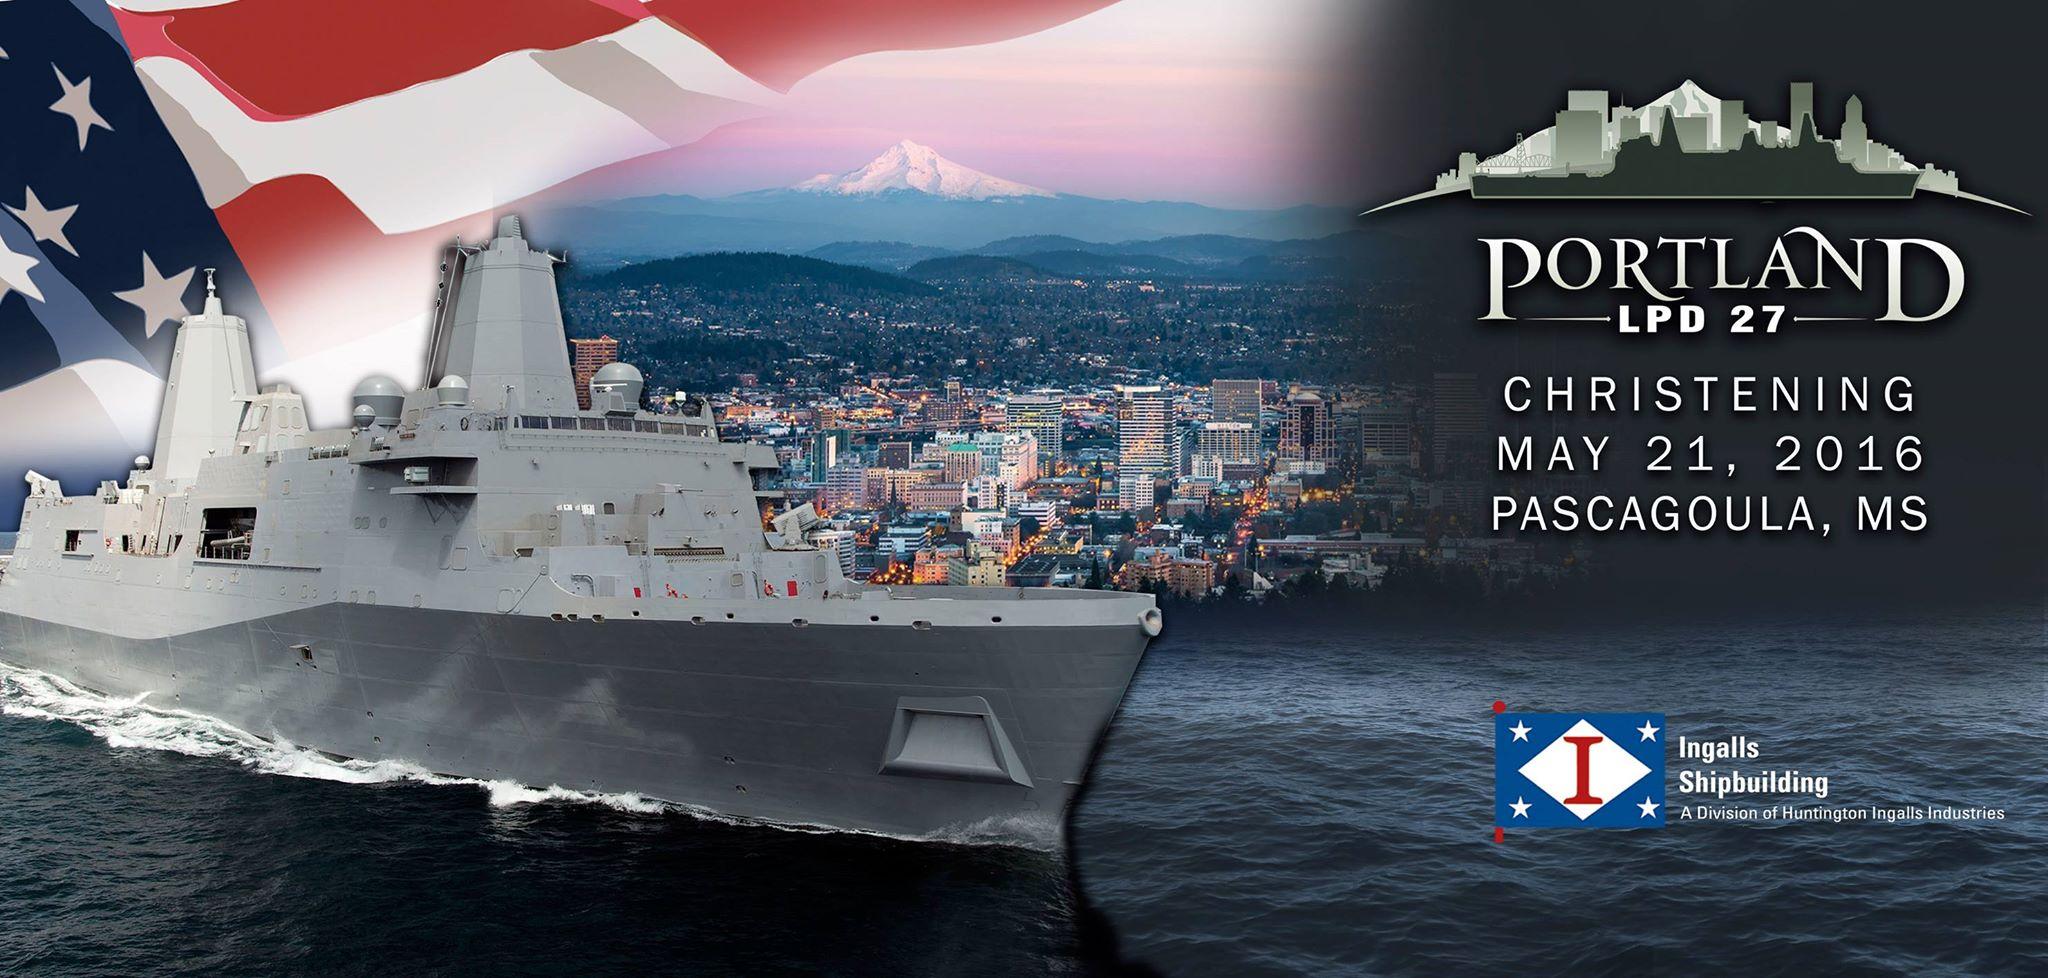 USS PORTLAND LPD-27 Christening Grafik: Huntington Ingalls Industries